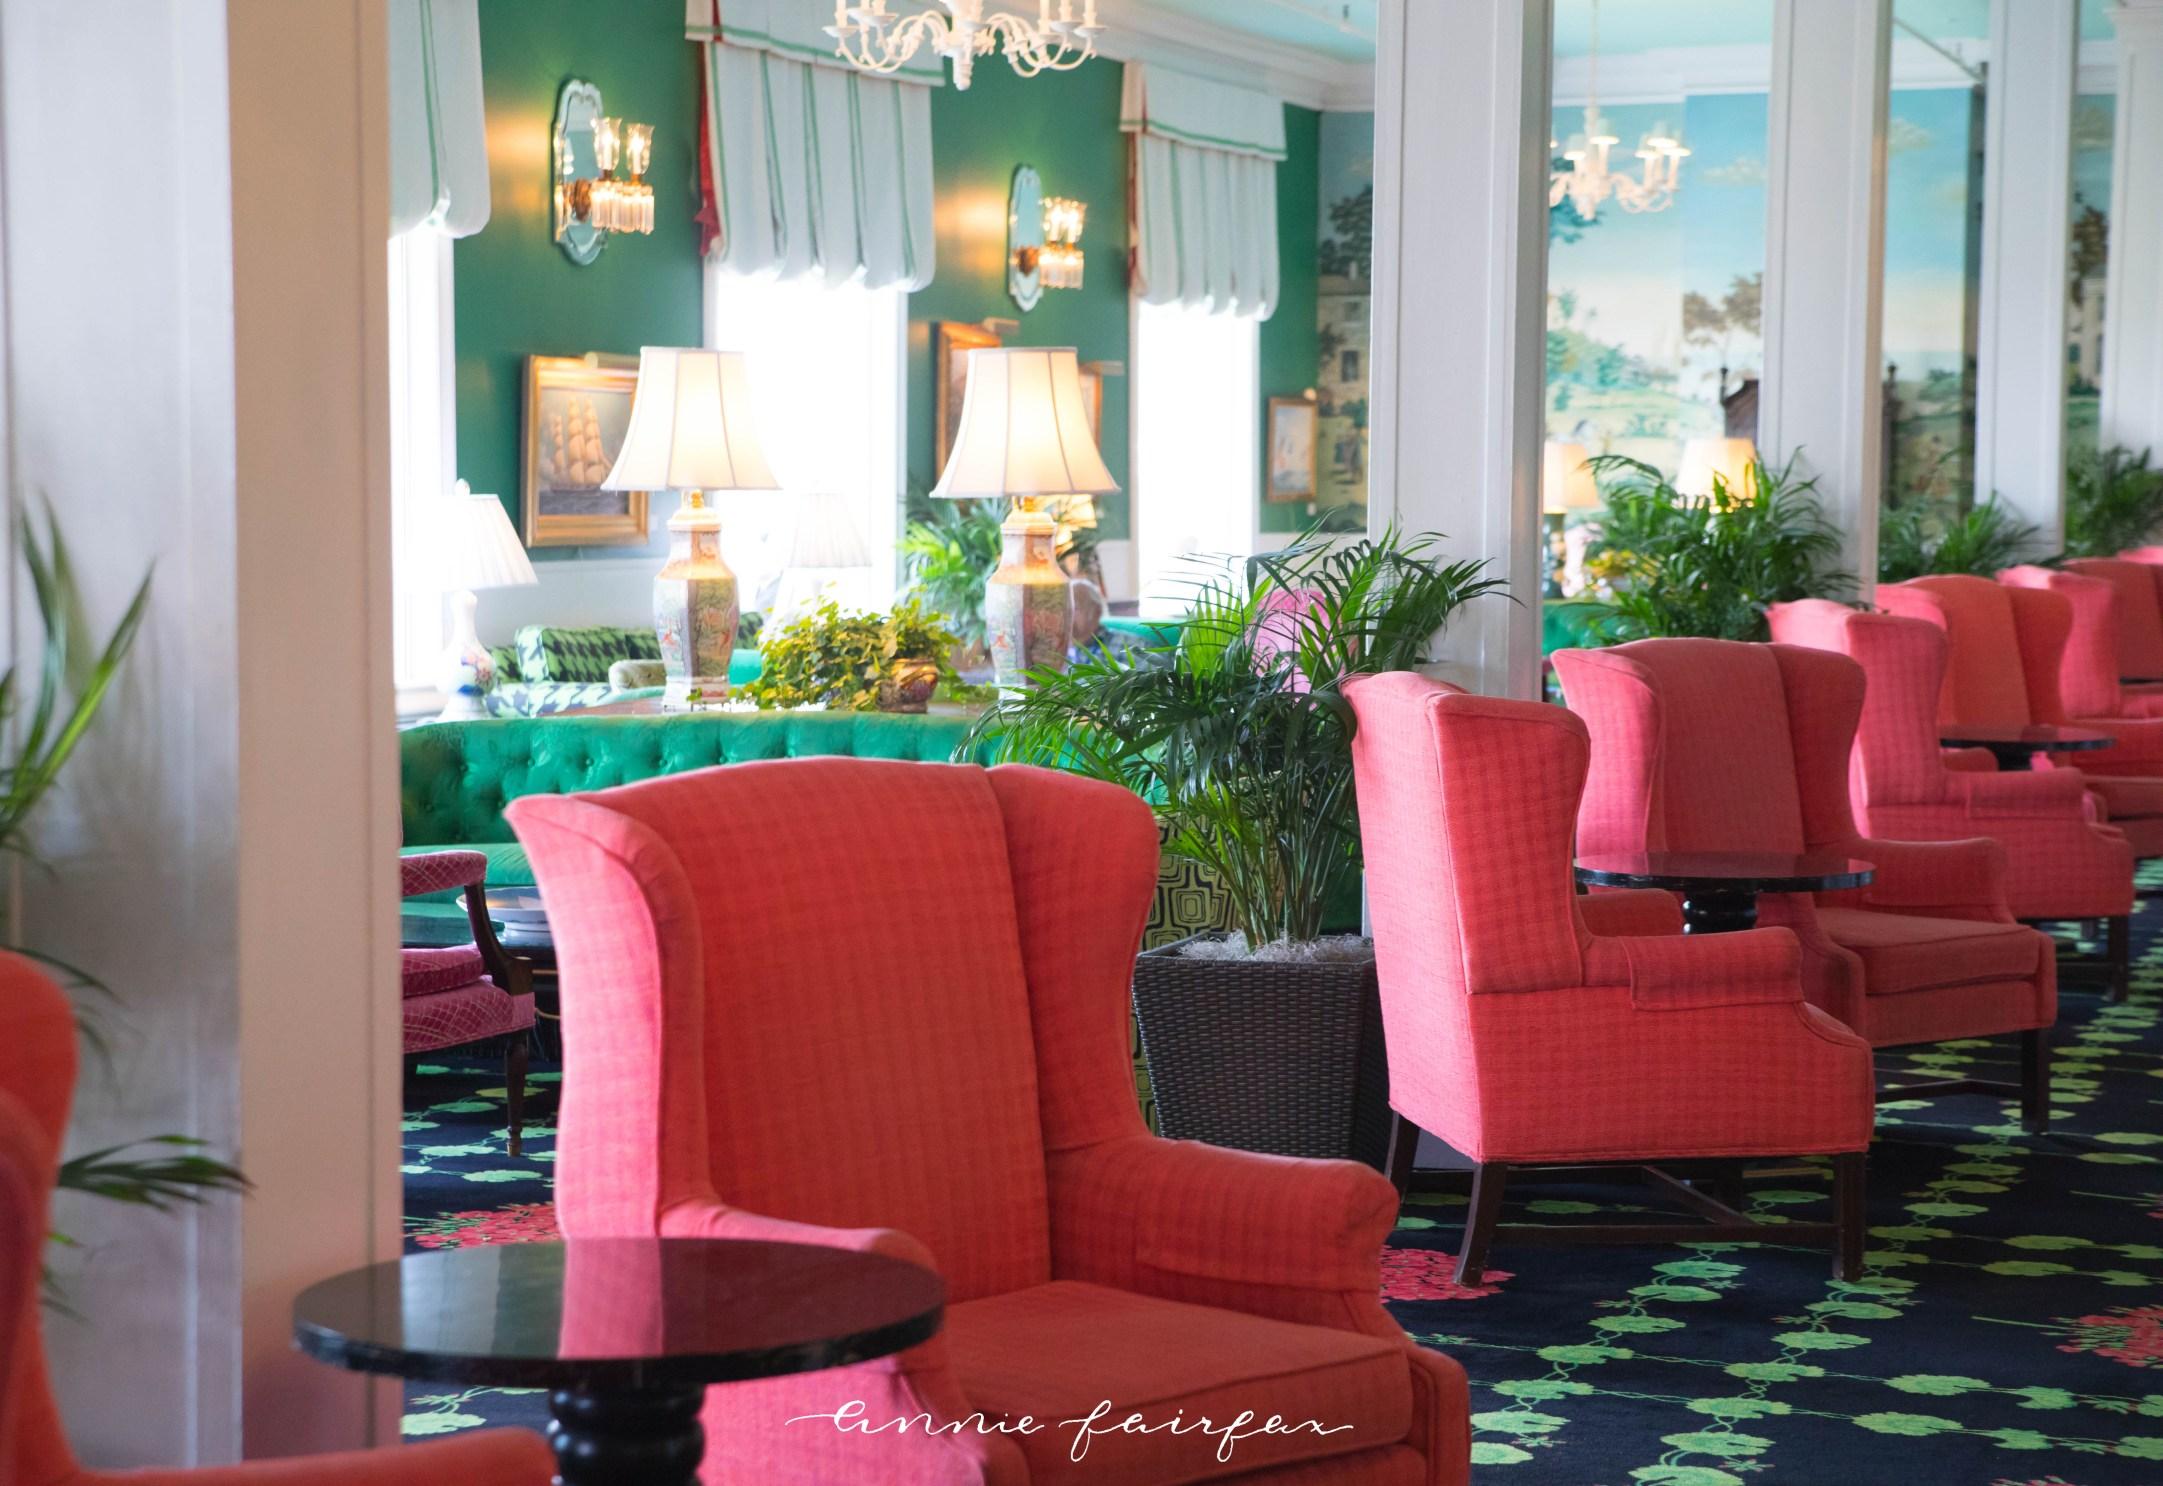 Lobby of the Grand Hotel on Mackinac Island